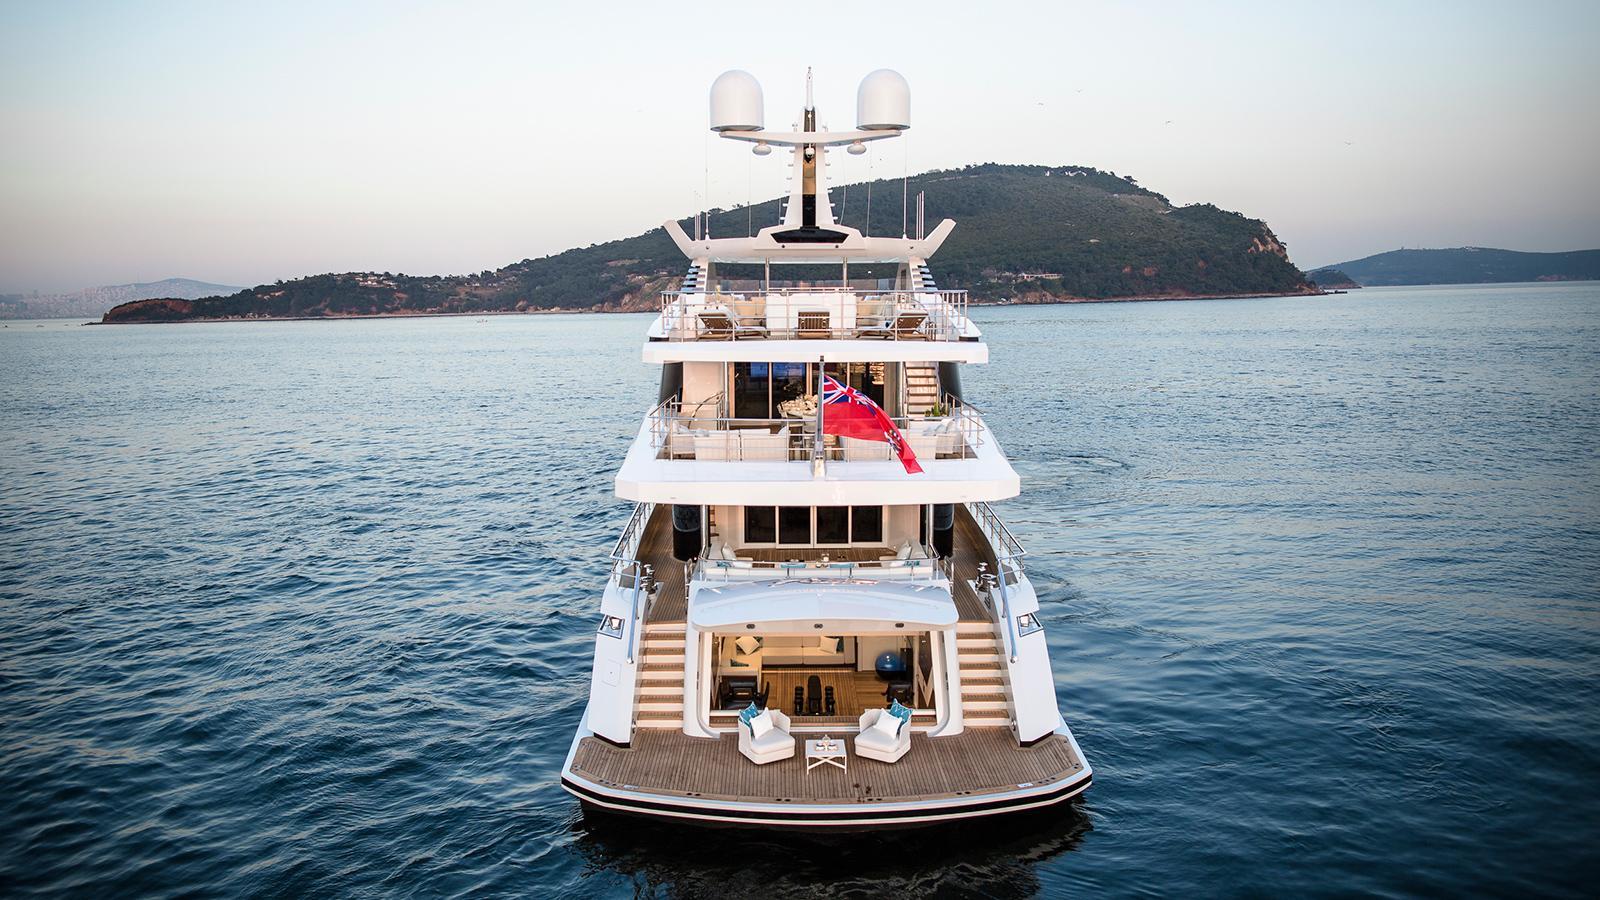 roe razan motoryacht turquoise yachts 2017 47m stern